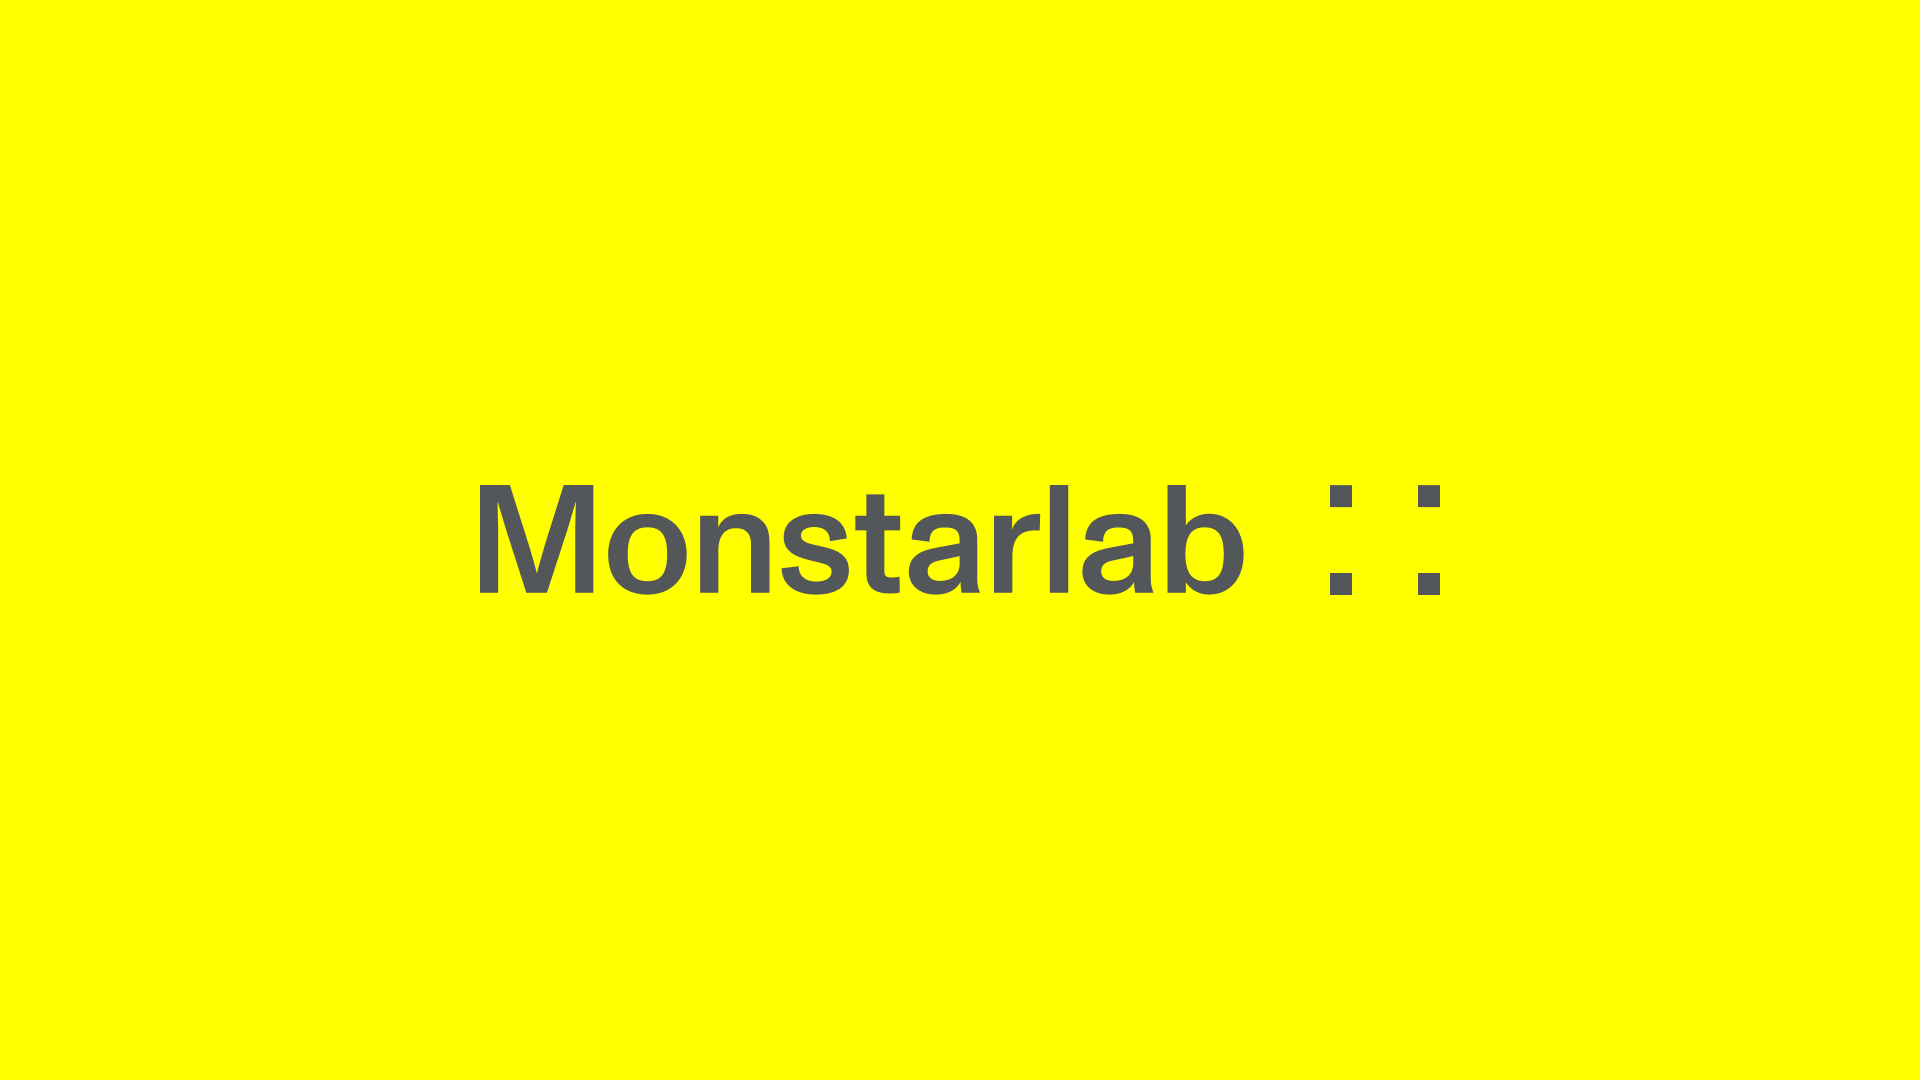 Monstarlab logo new corporate identity